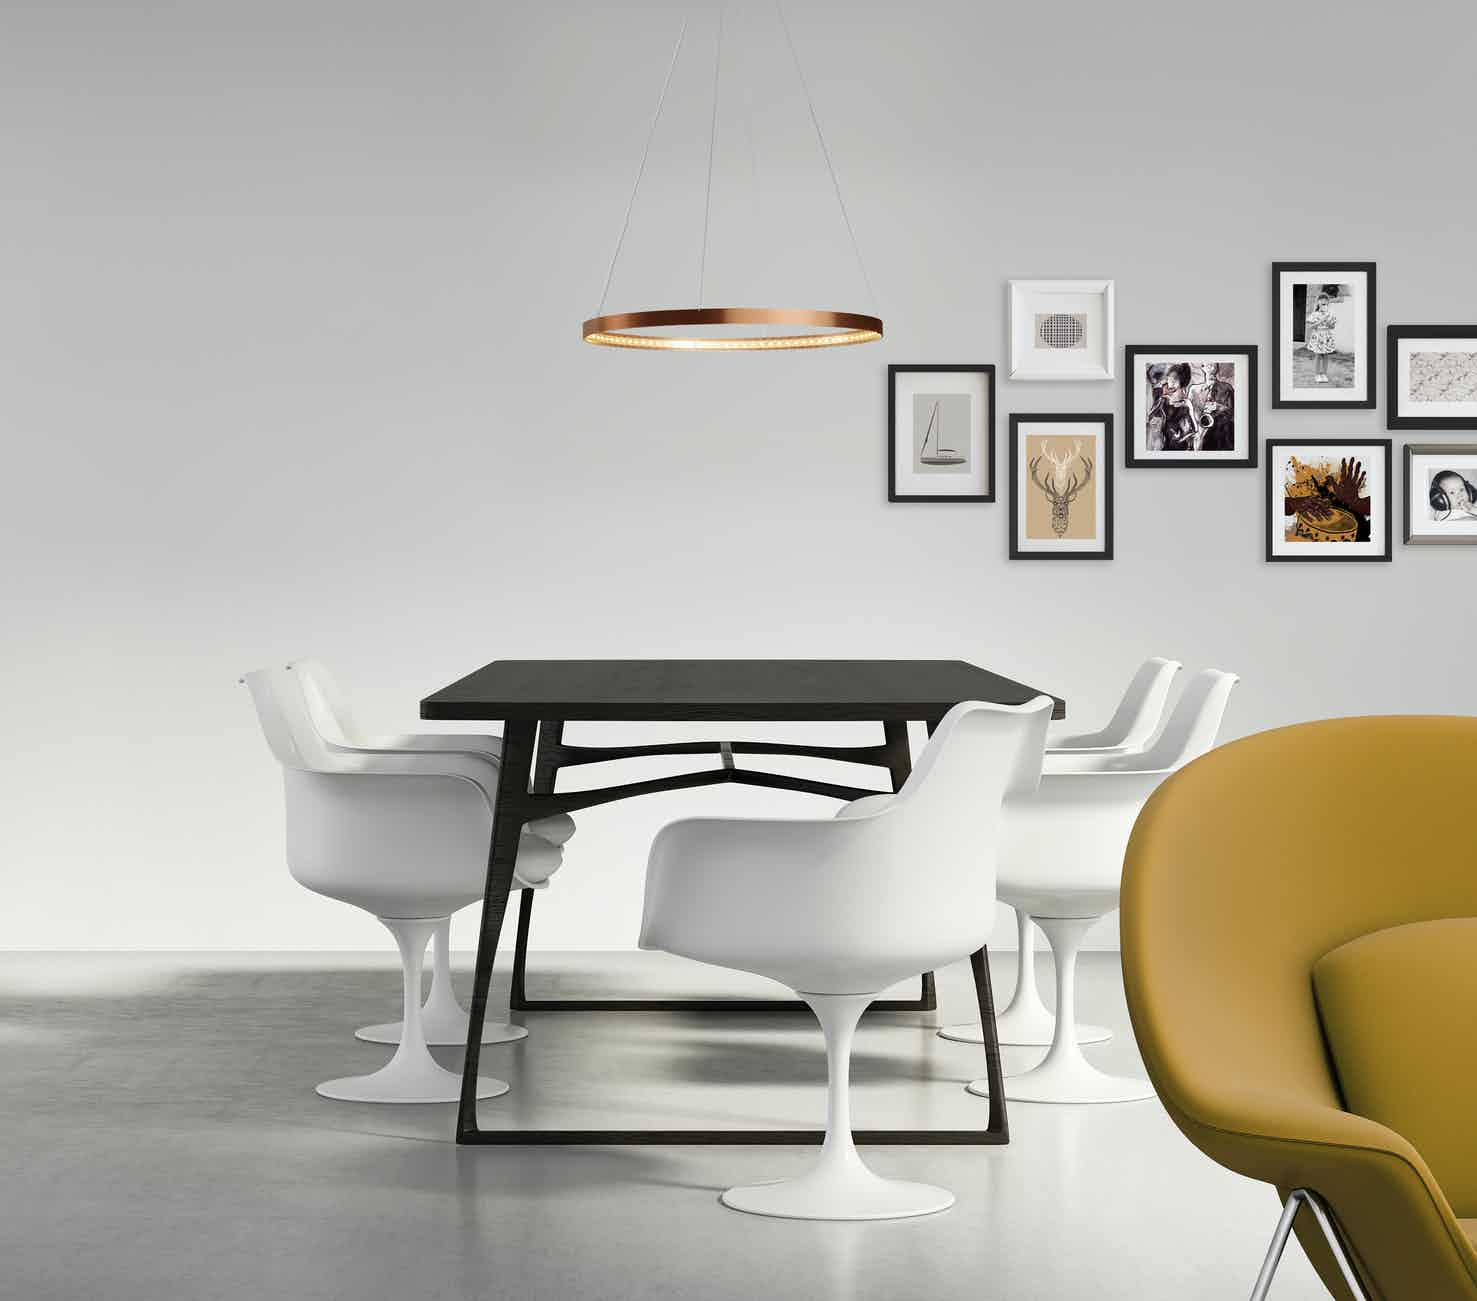 Le-deun-luminaires-circle-60-hanging-lamp-copper-table-haute-living